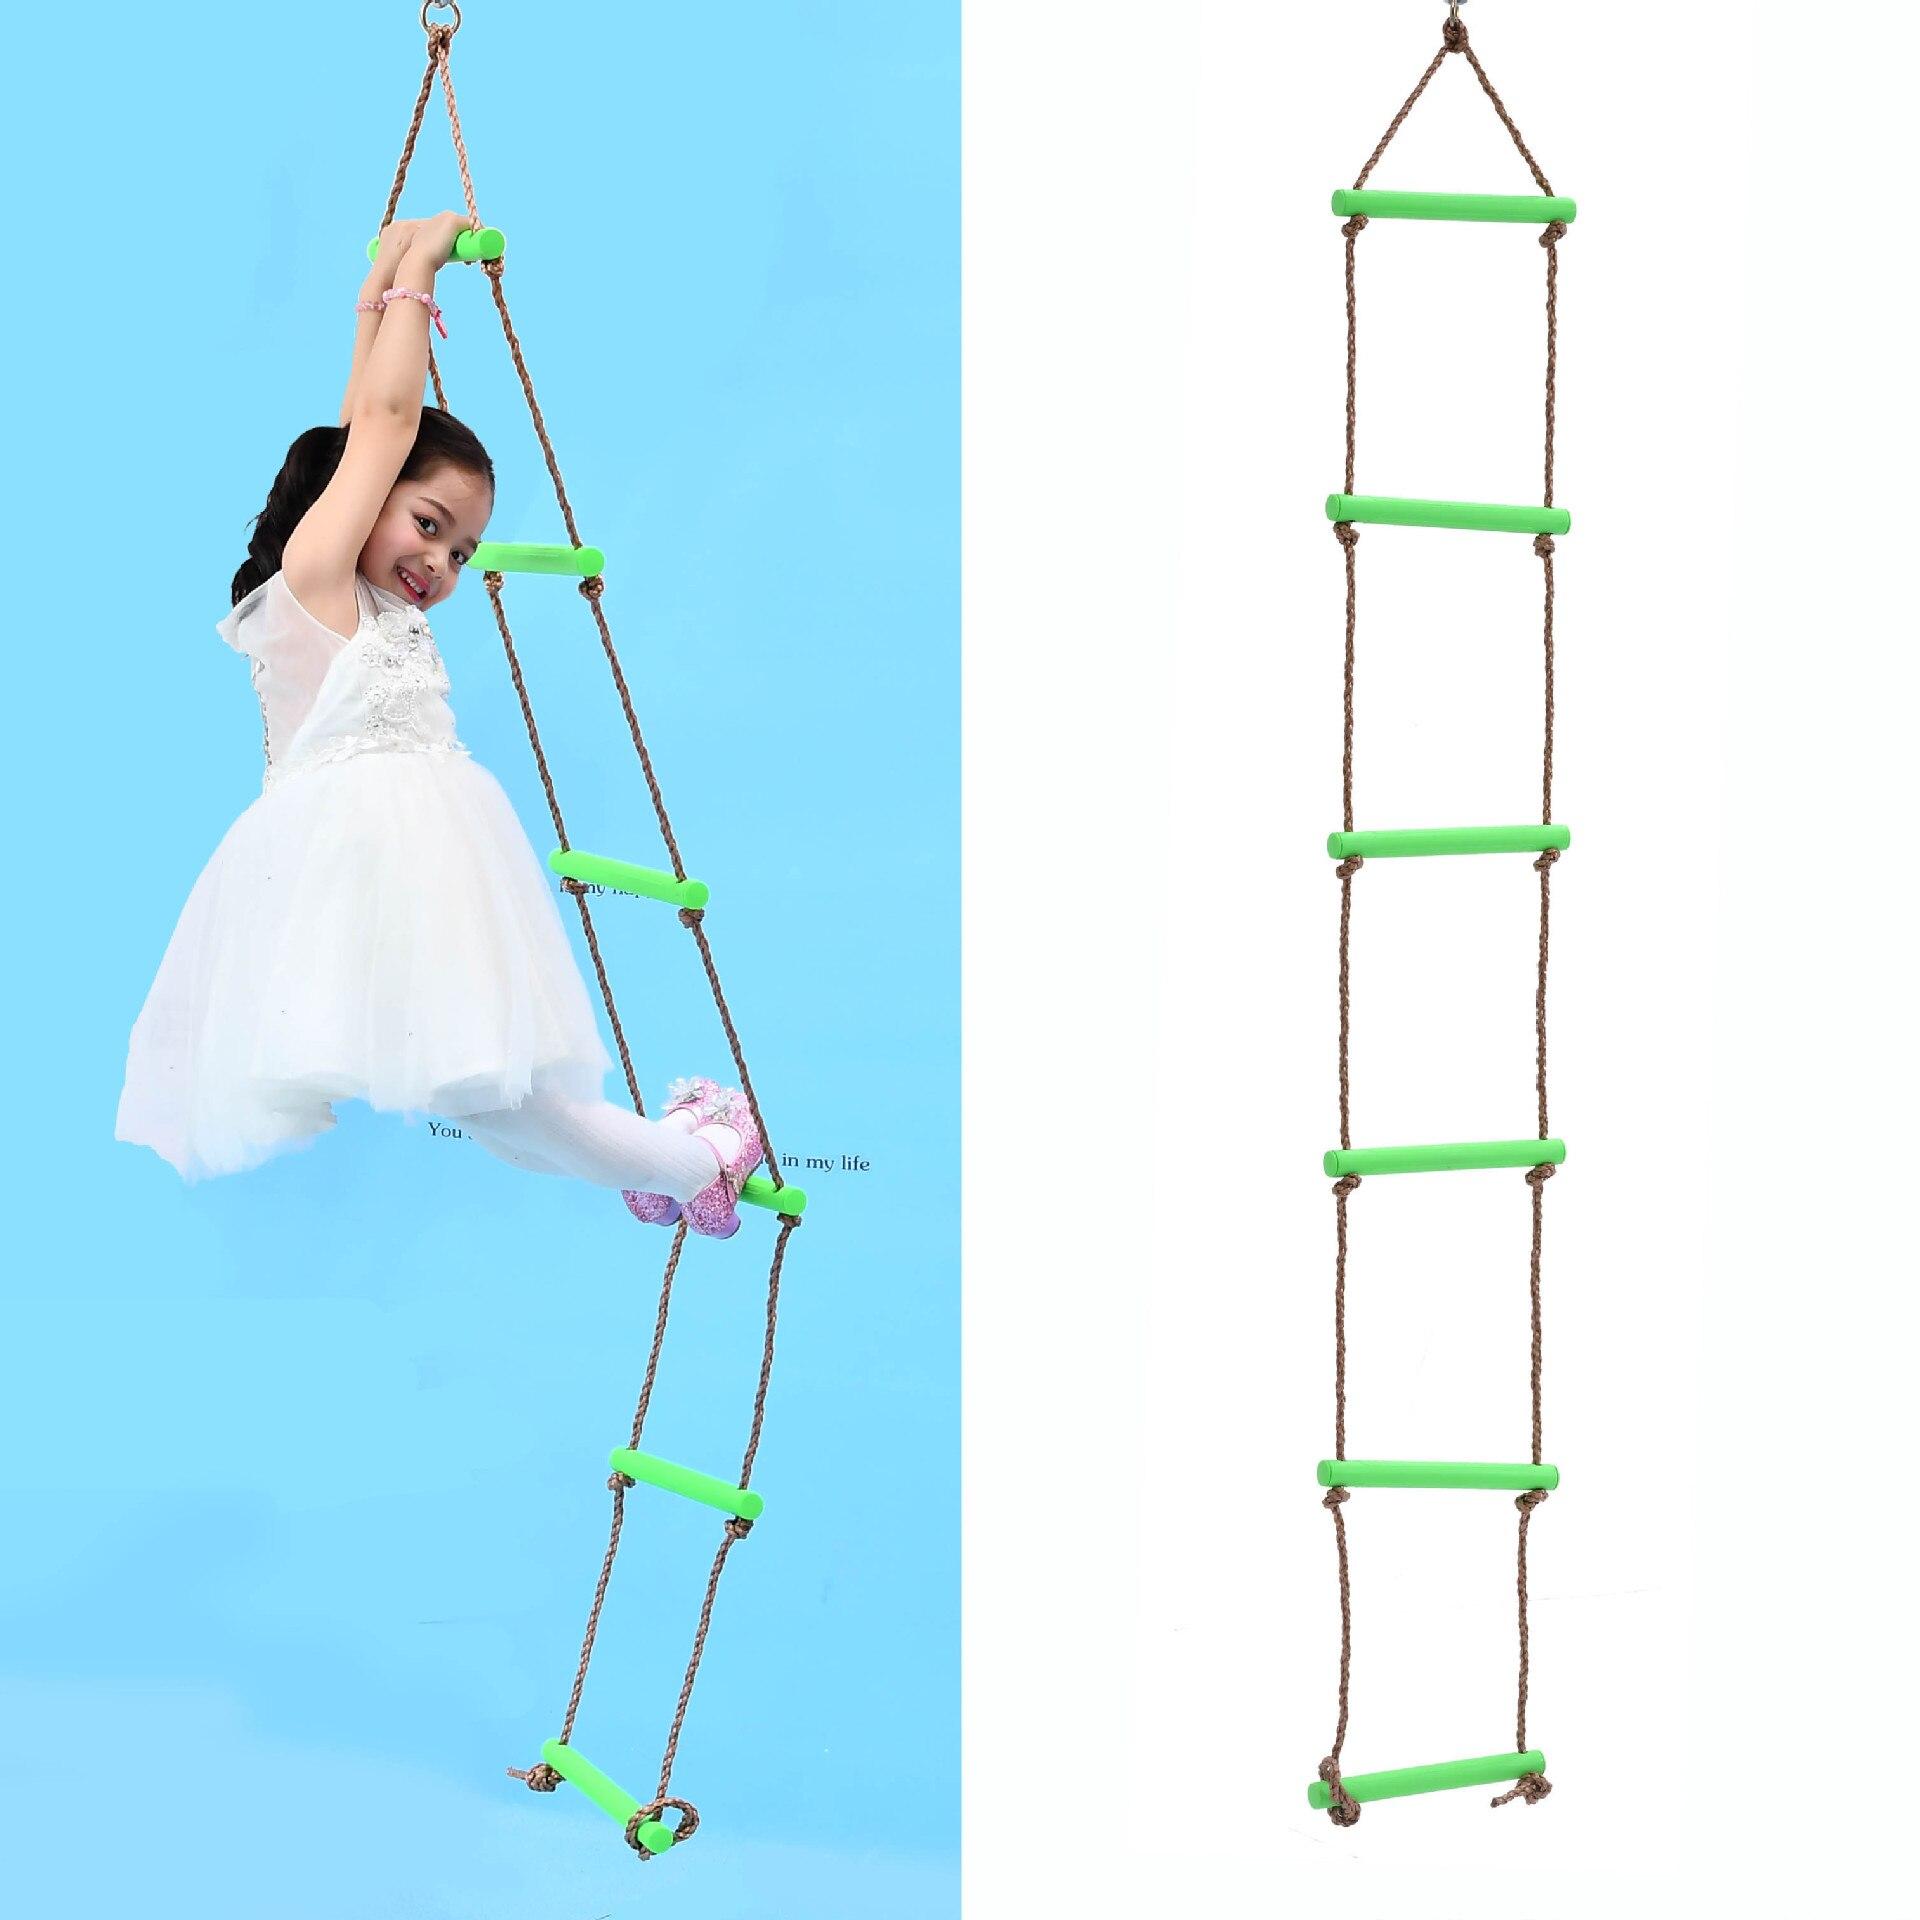 Six Gear Plastic Climbing Ladder Swing Outdoor Training Activity Safe Sports  Children Fitness Equipment For Kid Baby SwingLB374